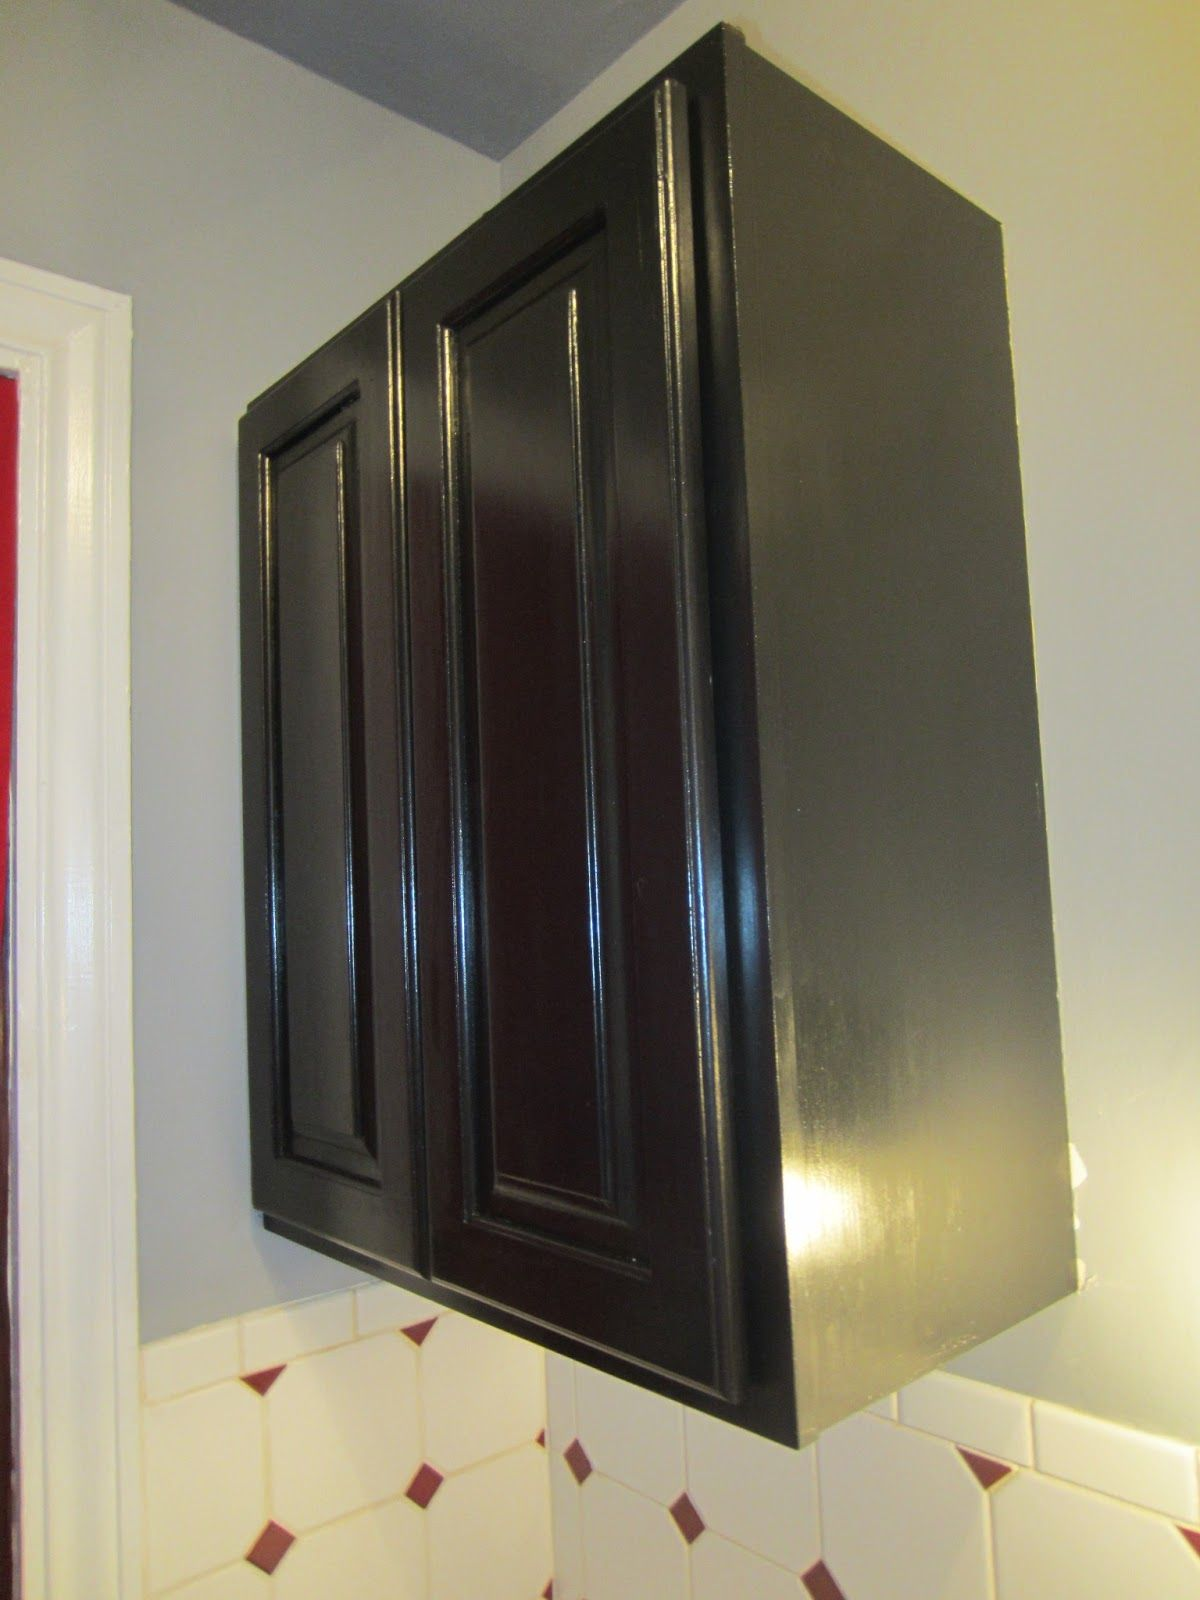 Very Small Bathroom Storage Ideas With Corner Shower Shelf ... on Corner Sconce Shelf Cabinet id=32336